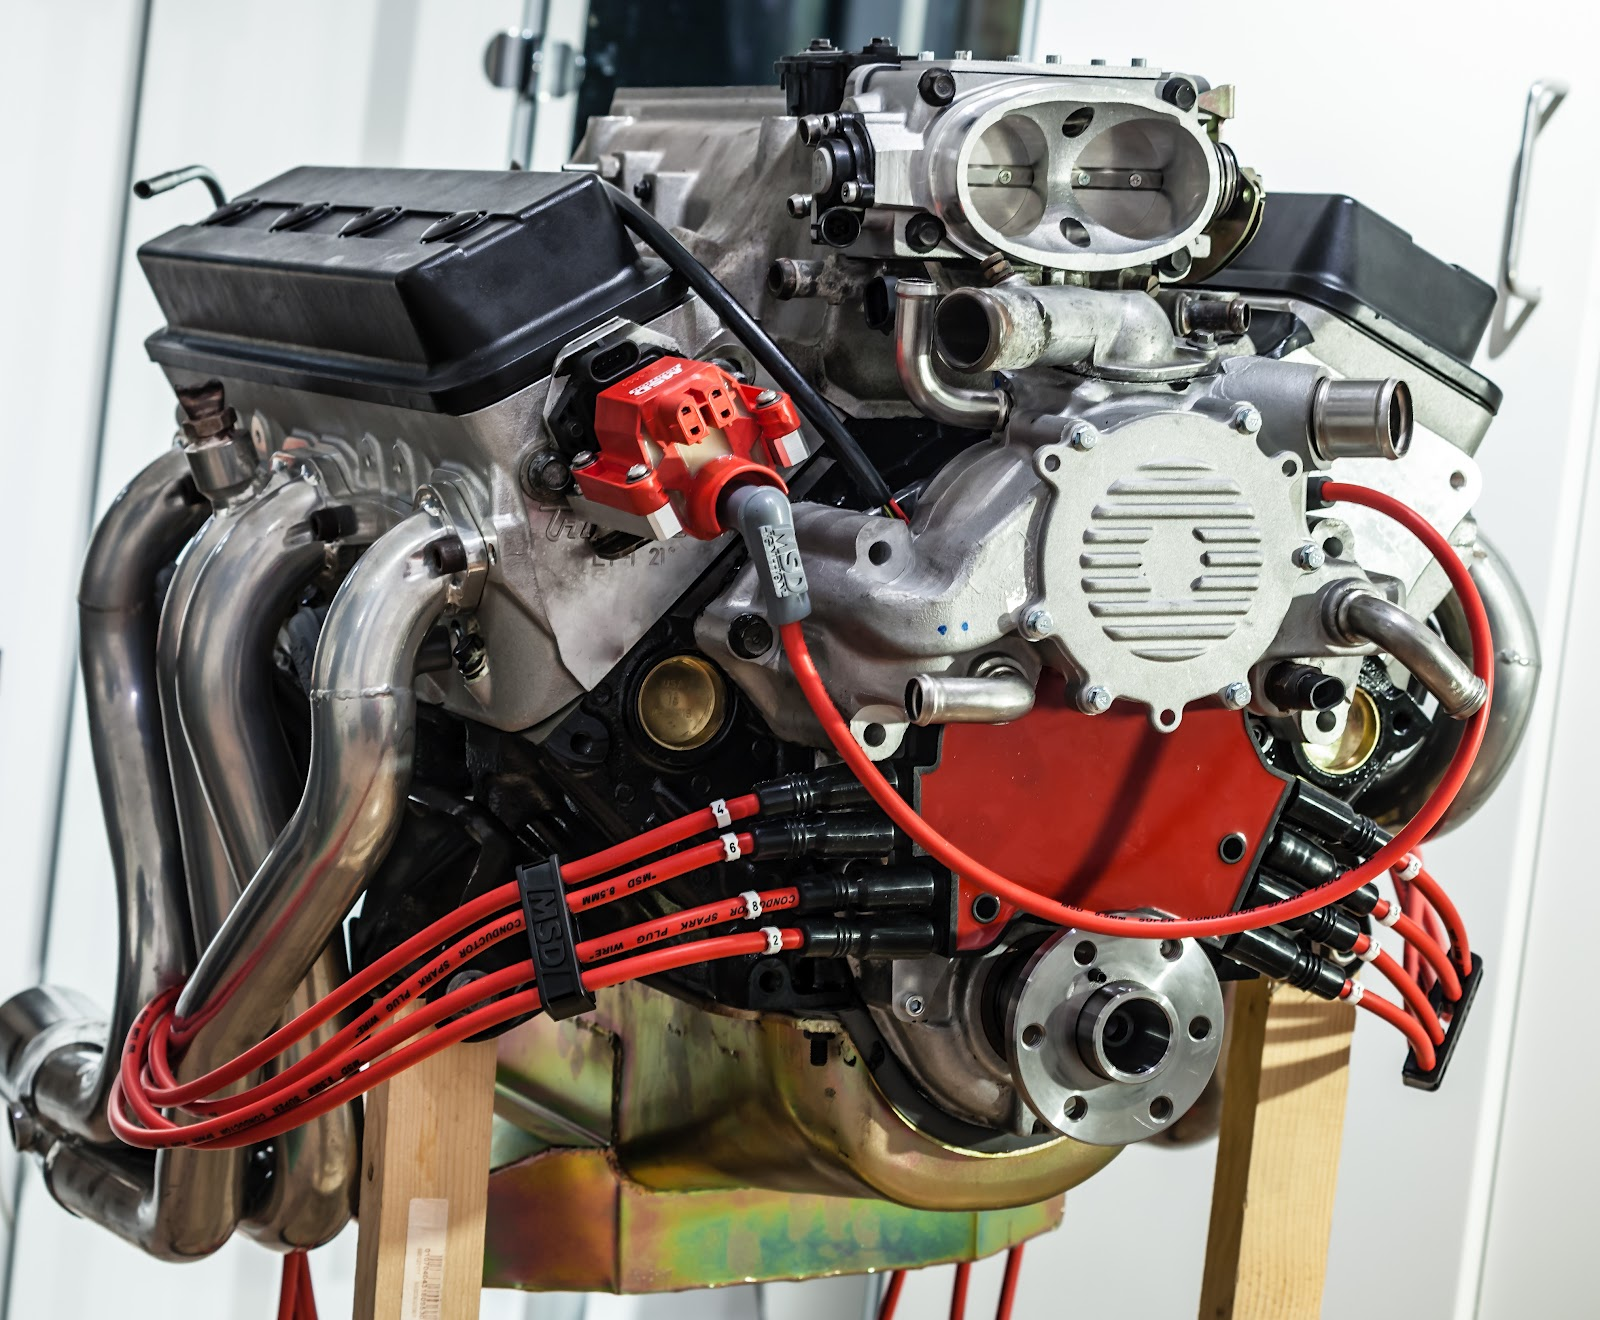 medium resolution of 1993 corvette engine shuts off immediately corvetteforum chevrolet corvette forum discussion